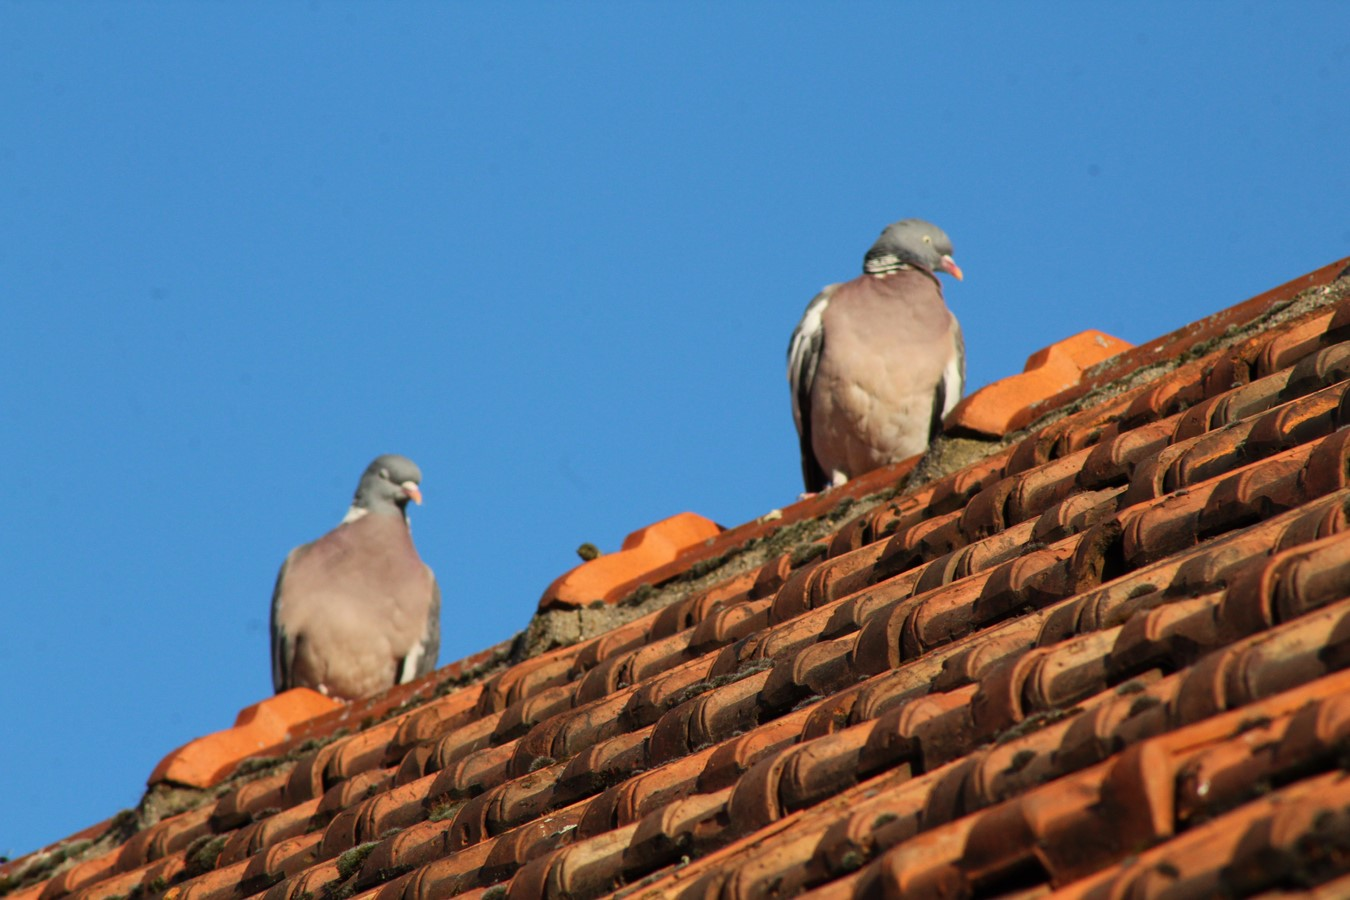 [Ouvert] FIL - Oiseaux. - Page 14 Img_9123